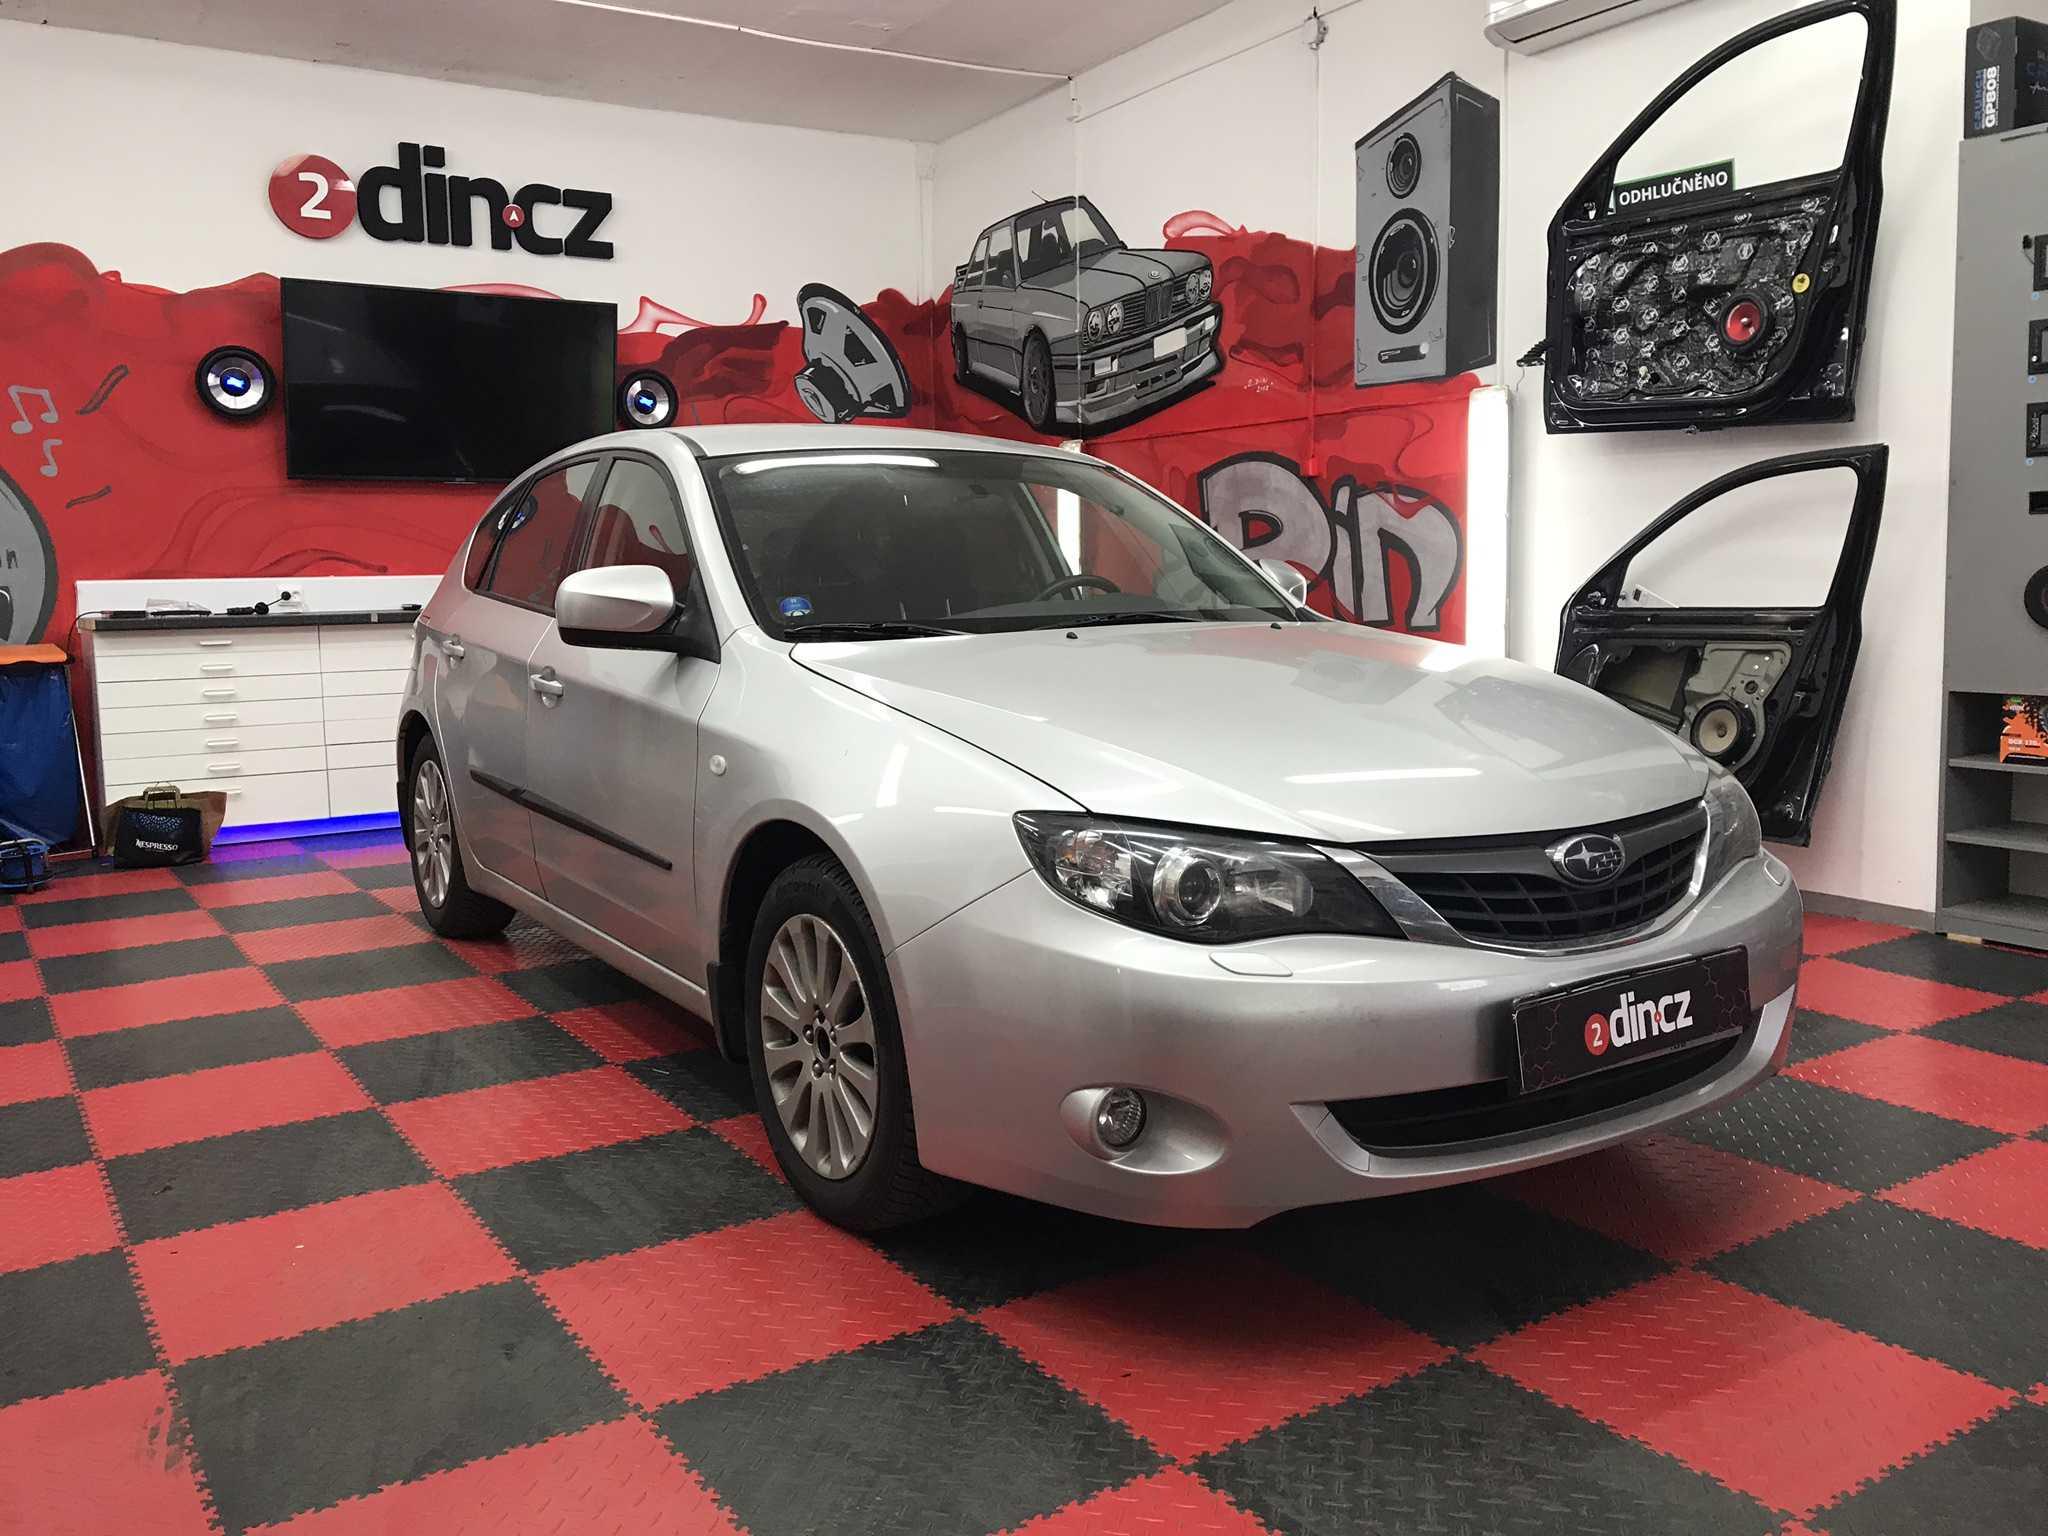 Subaru Impreza - Montáž 2din autorádia Kenwood